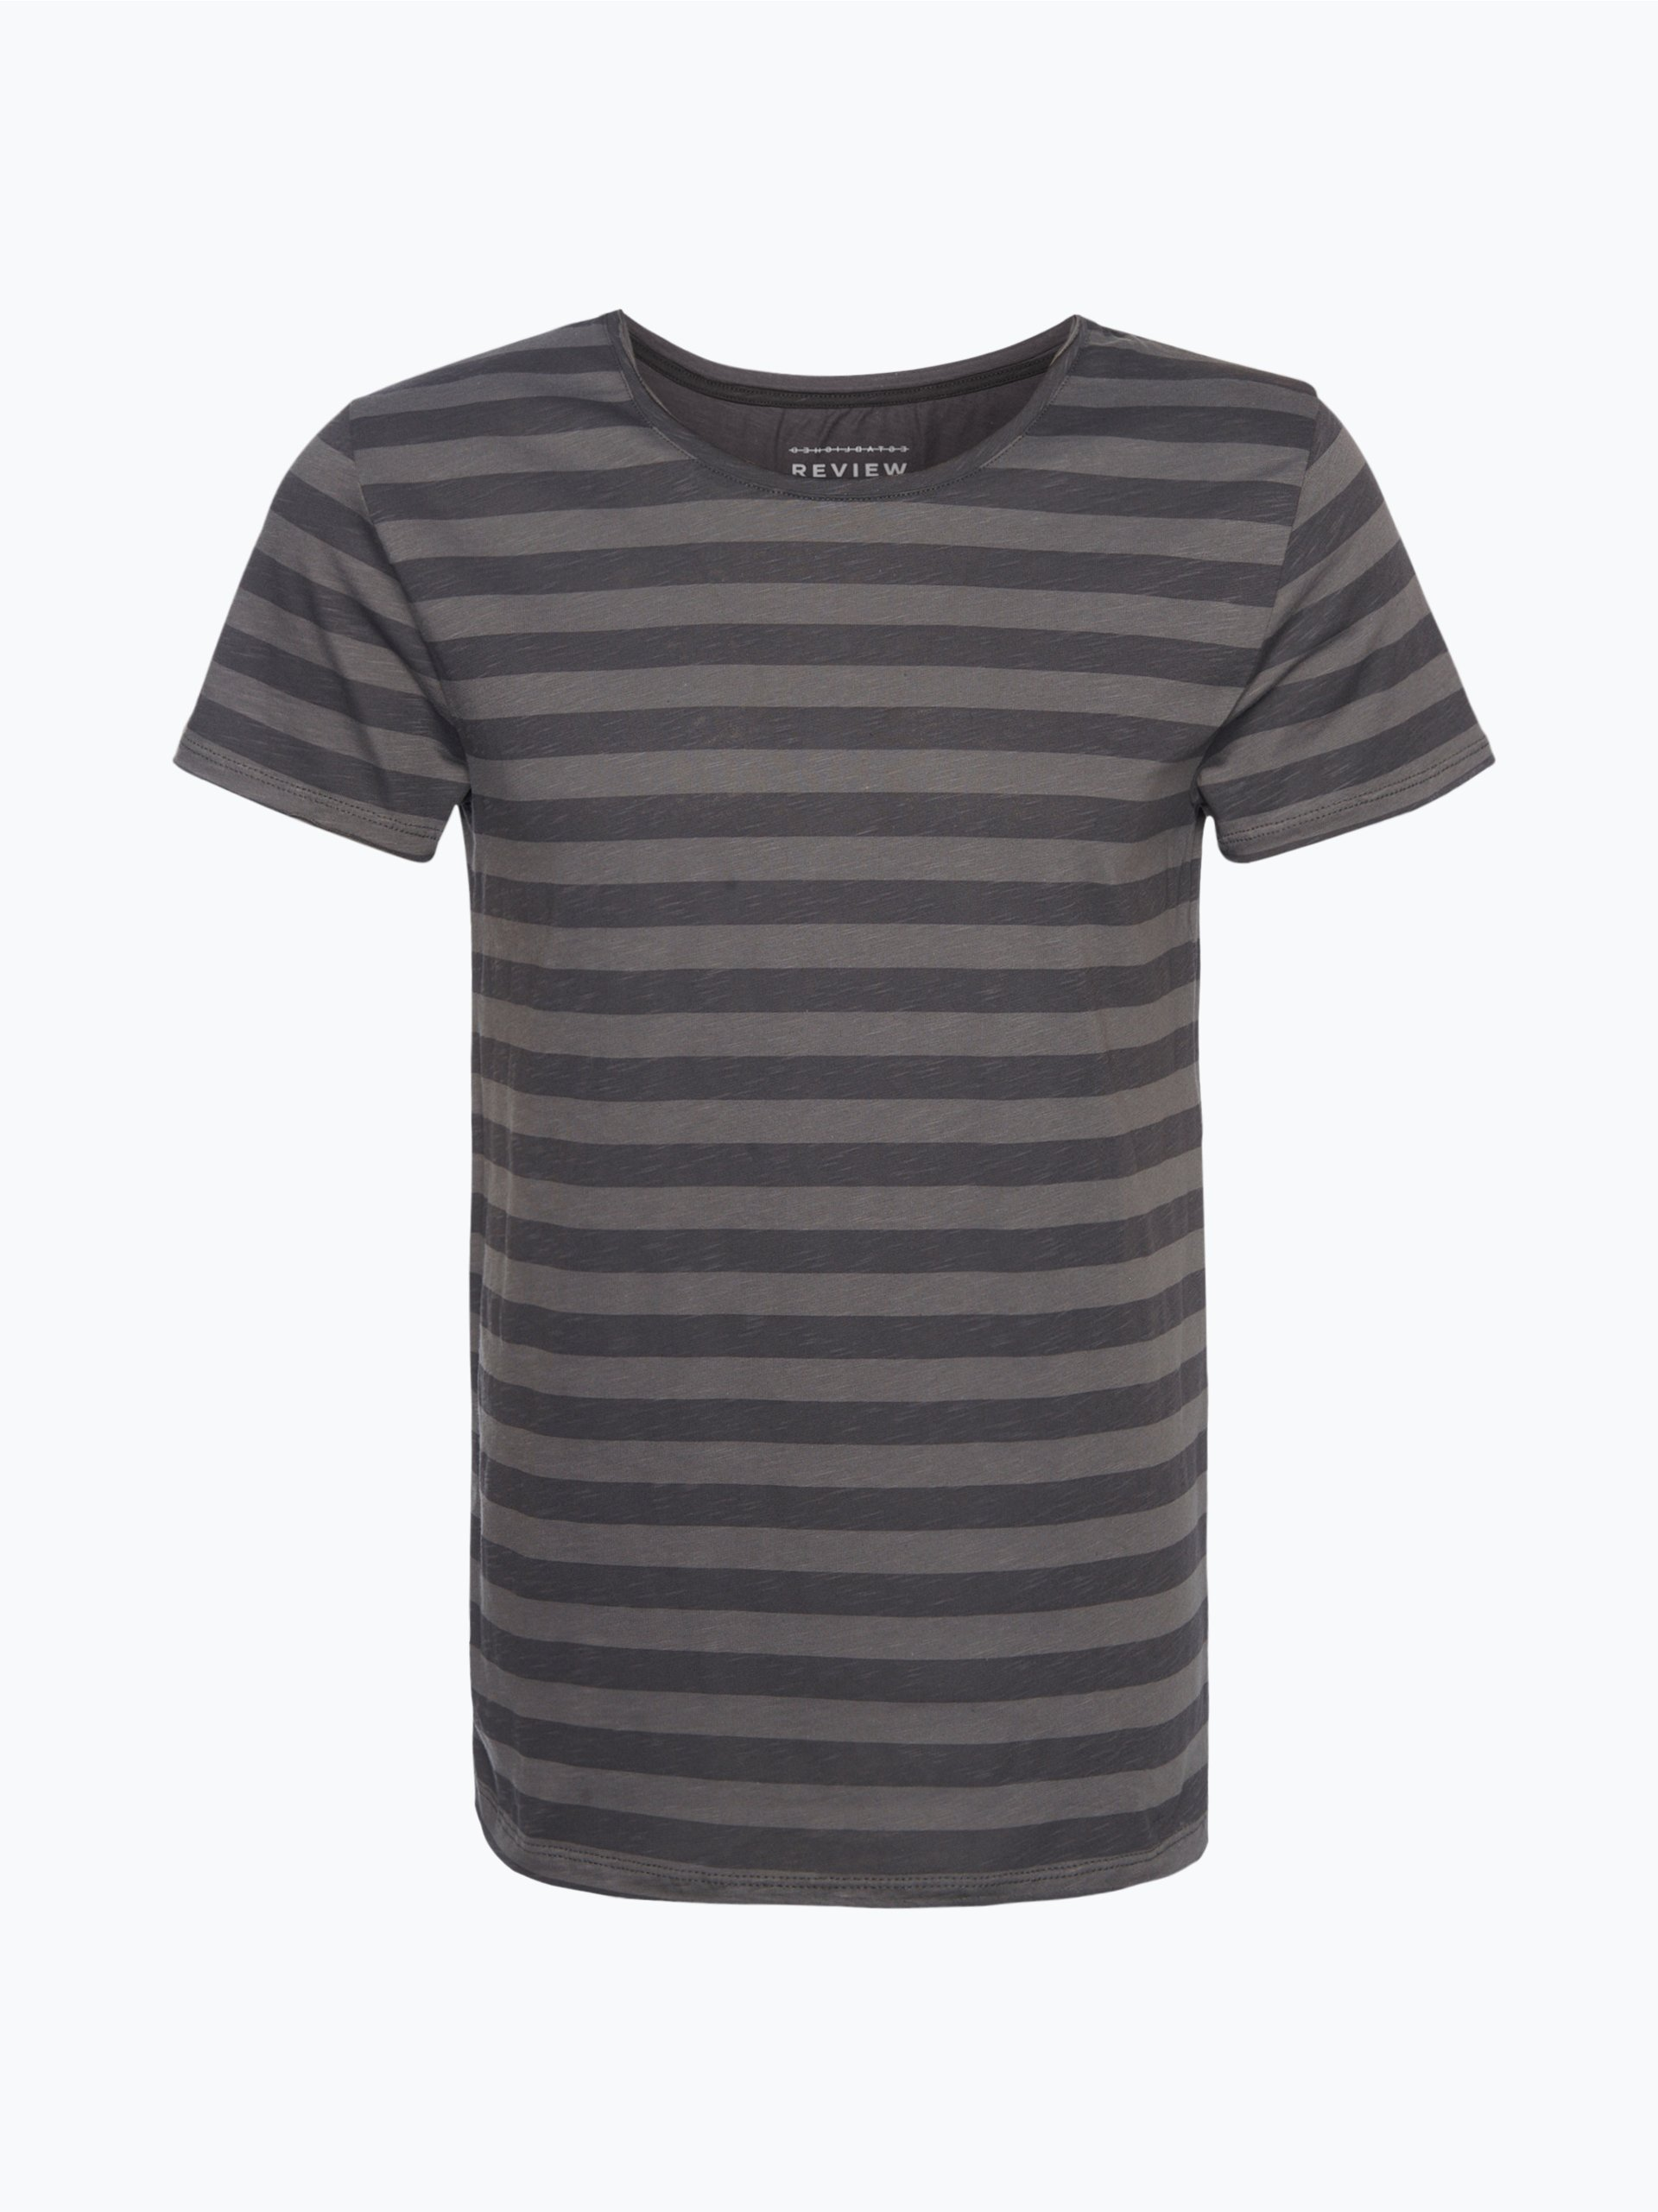 review herren t shirt grau gestreift online kaufen peek. Black Bedroom Furniture Sets. Home Design Ideas